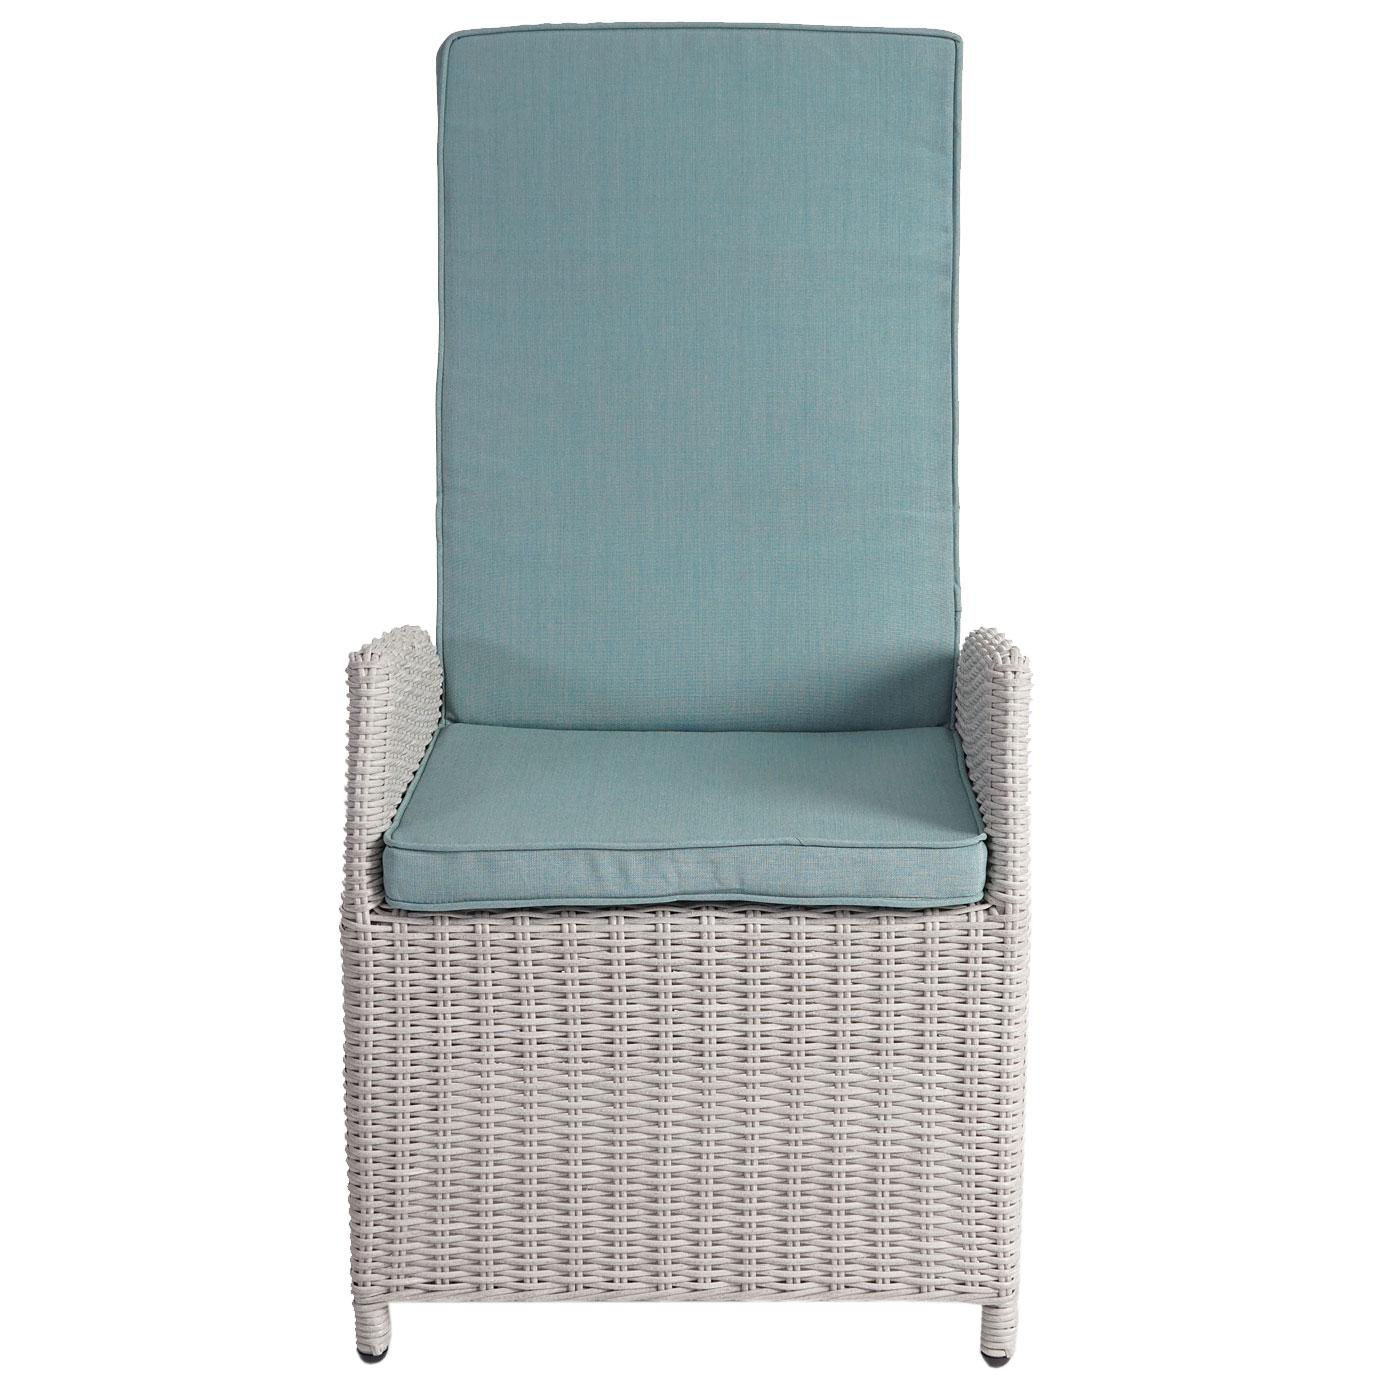 luxus poly rattan garnitur premium alu sitzgruppe tisch. Black Bedroom Furniture Sets. Home Design Ideas